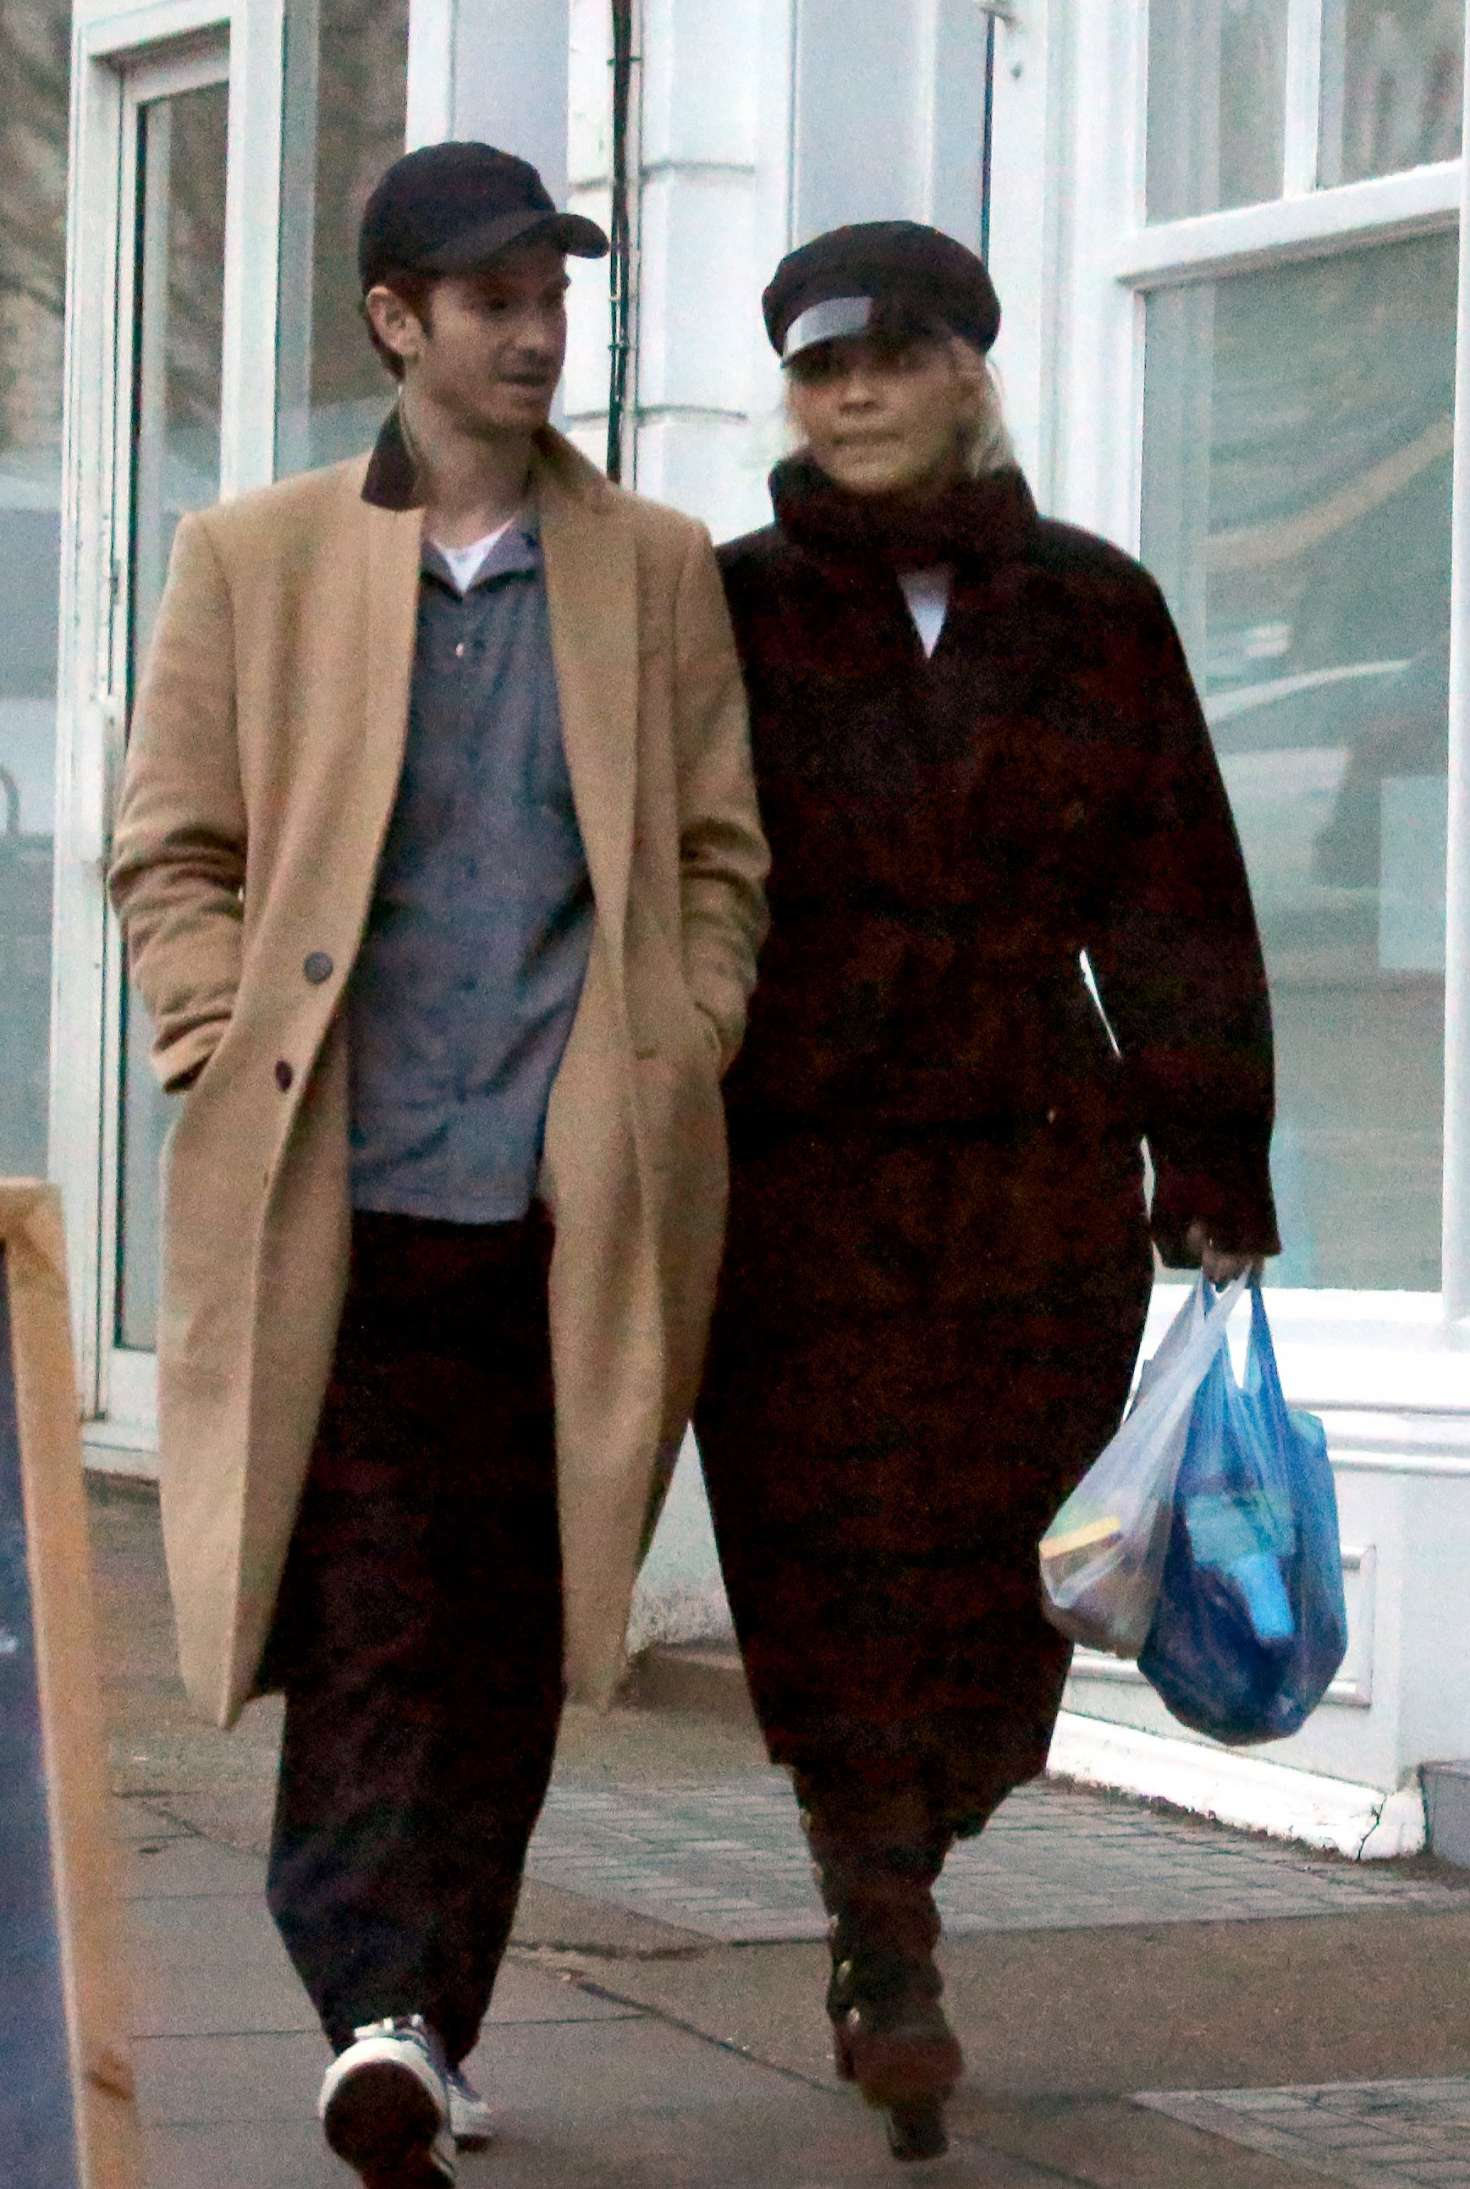 Rita Ora and Andrew Garfield - Shopping in Primrose Hill